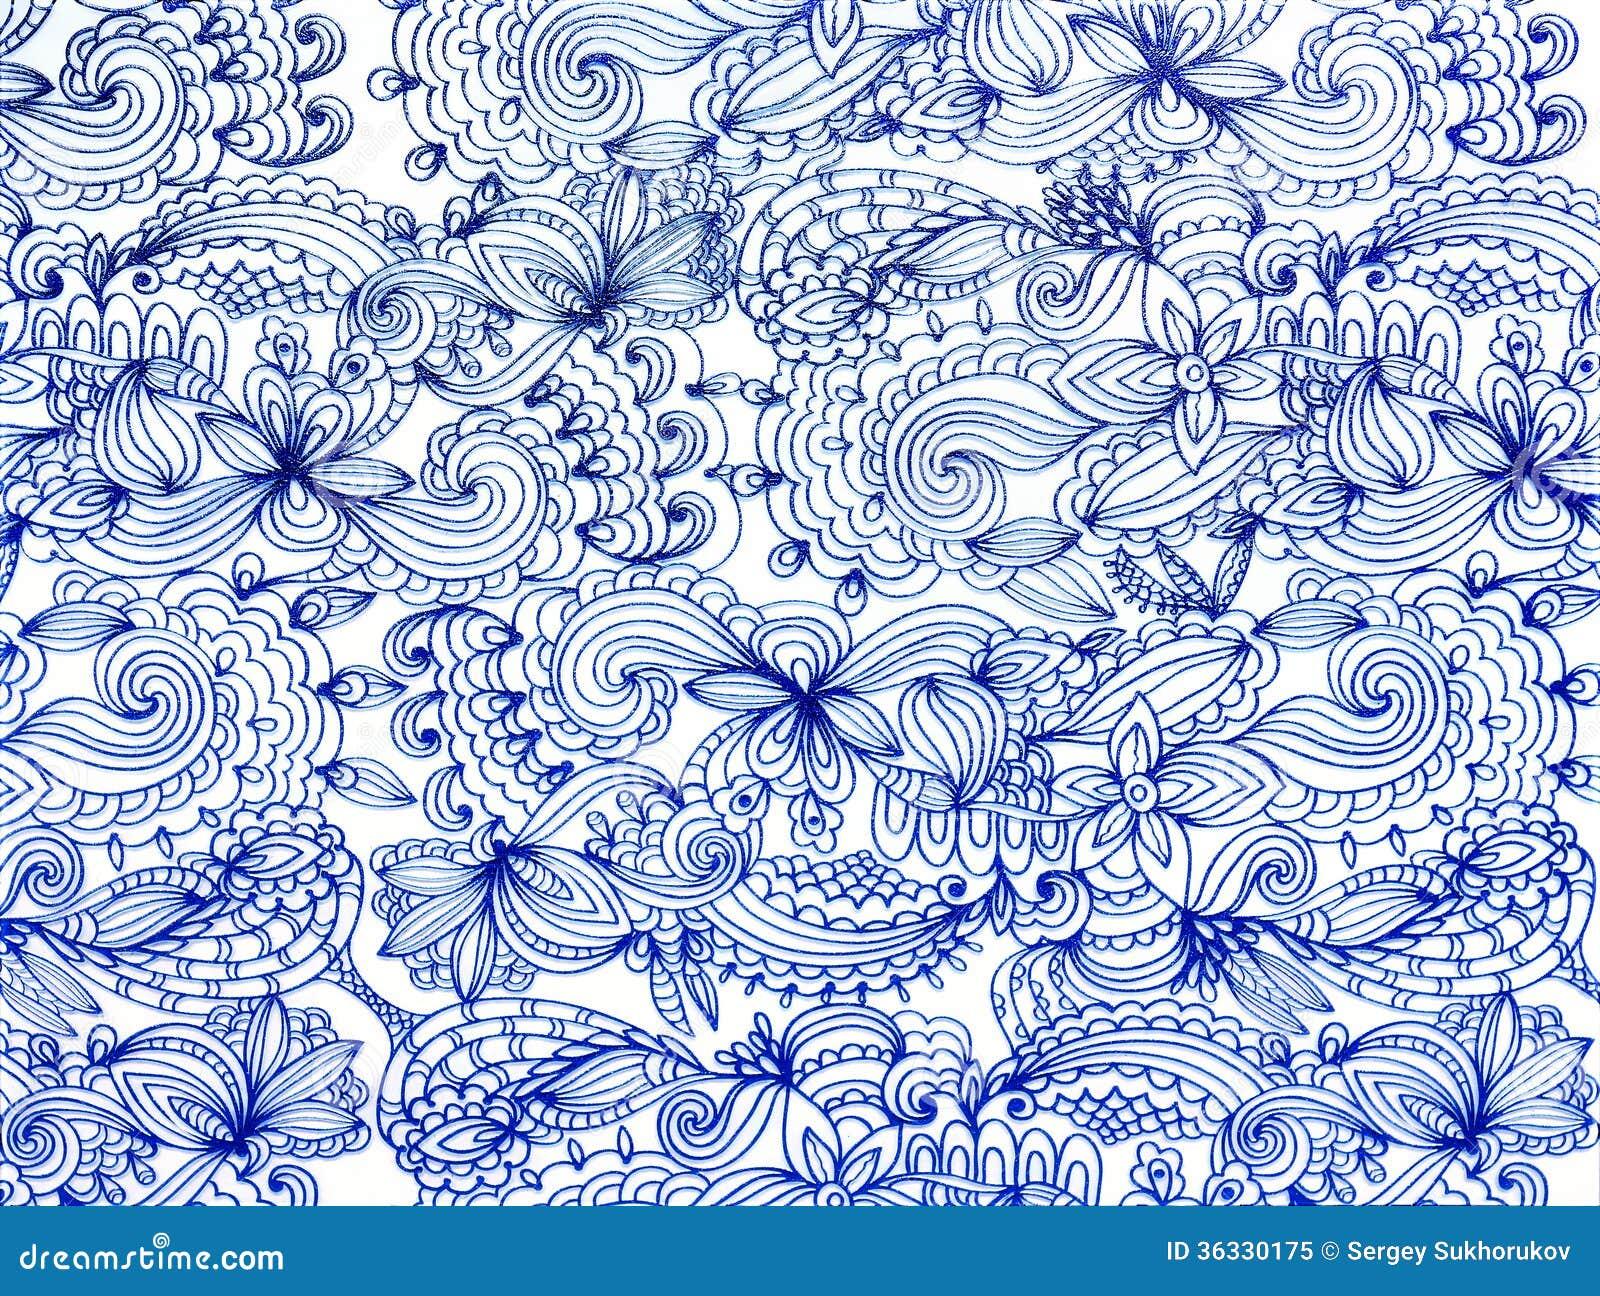 Blue Lace Pattern Royalty Free Stock Photo - Image: 36330175